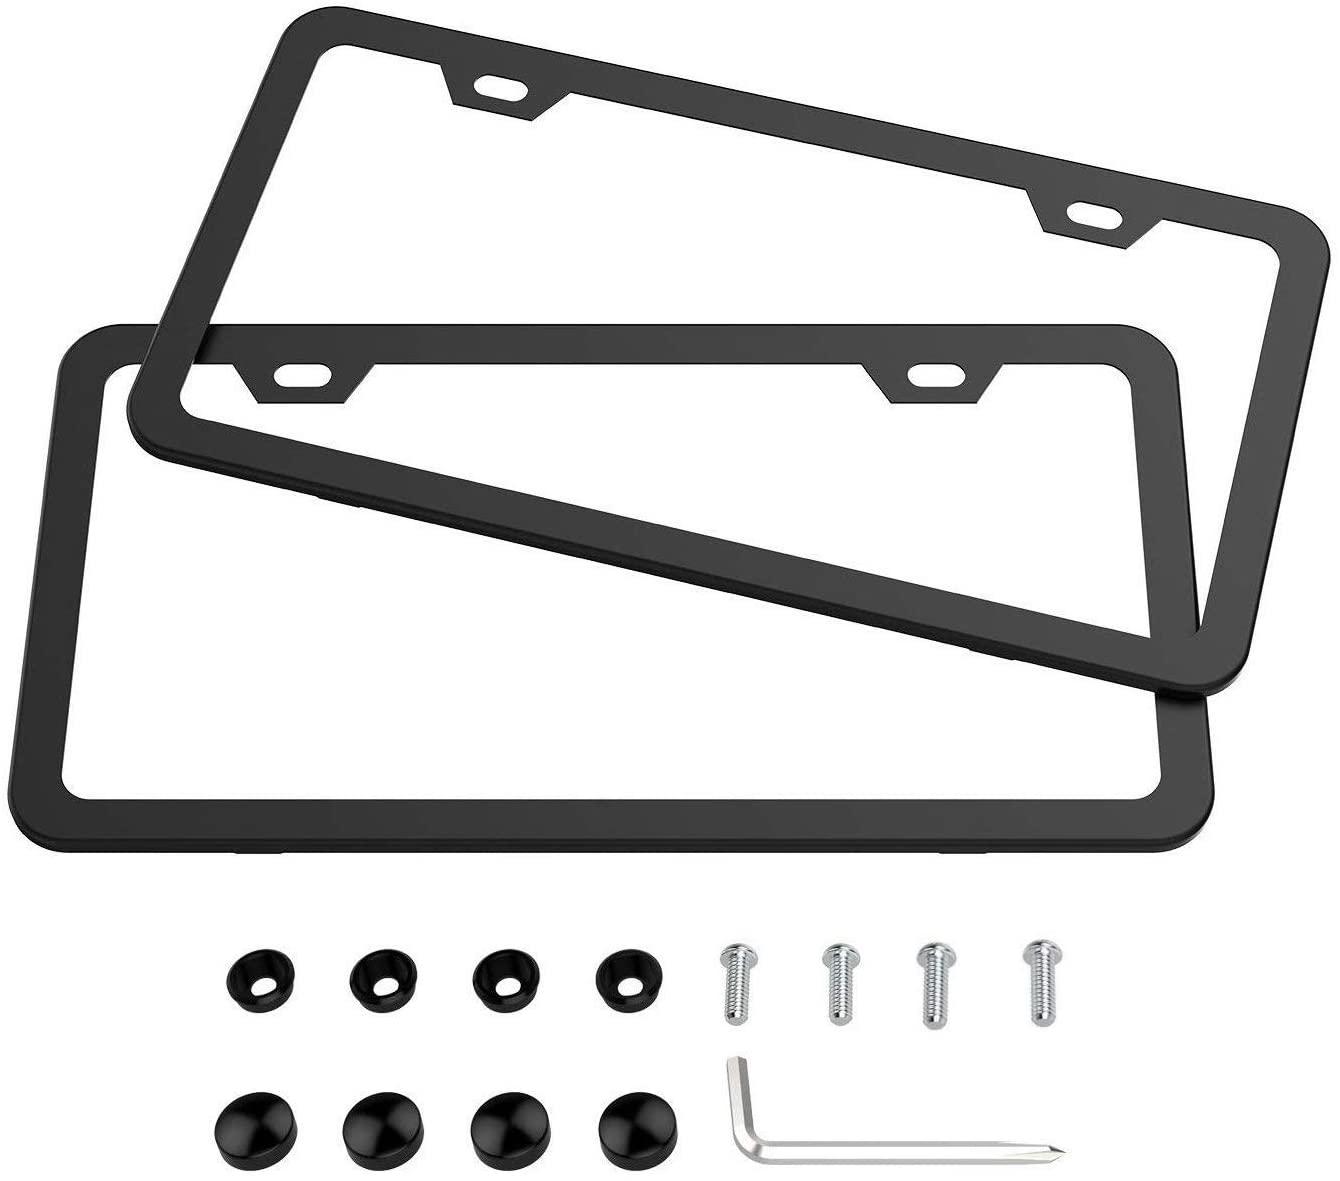 Karoad Slim Design Black Aluminum License Plate Frames